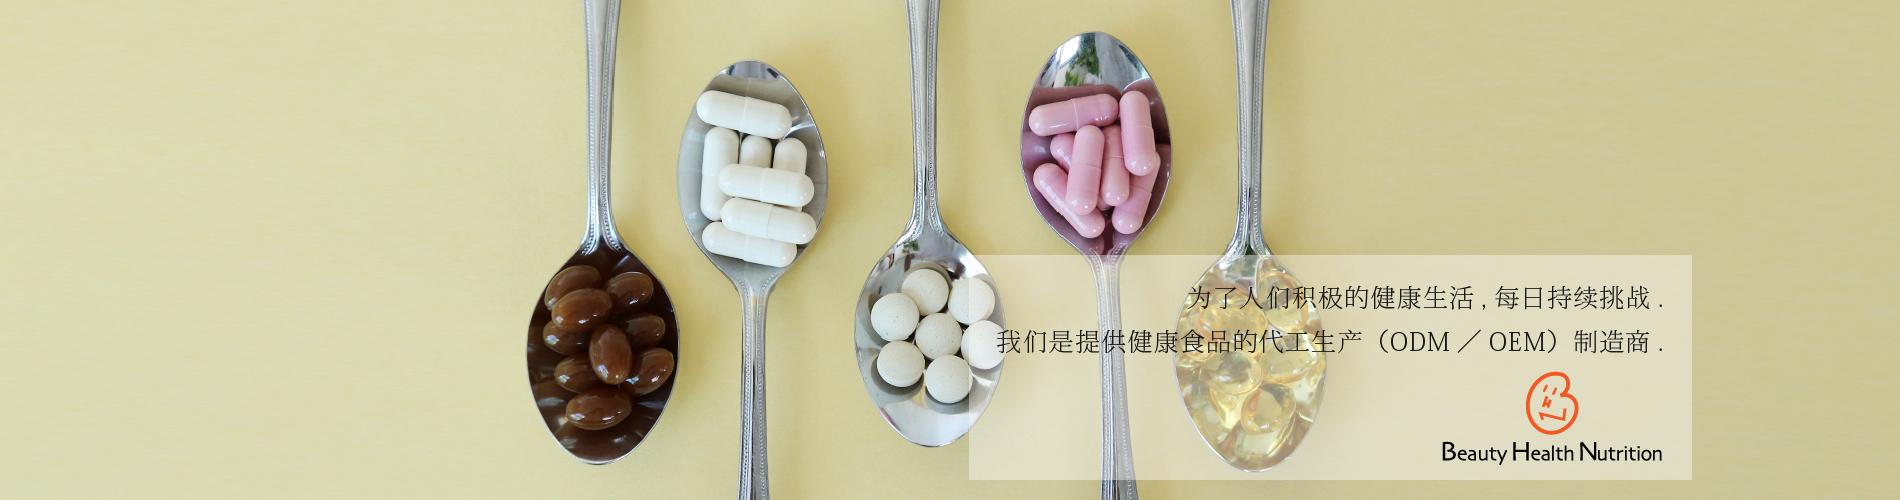 BHN株式会社【中文】toppage